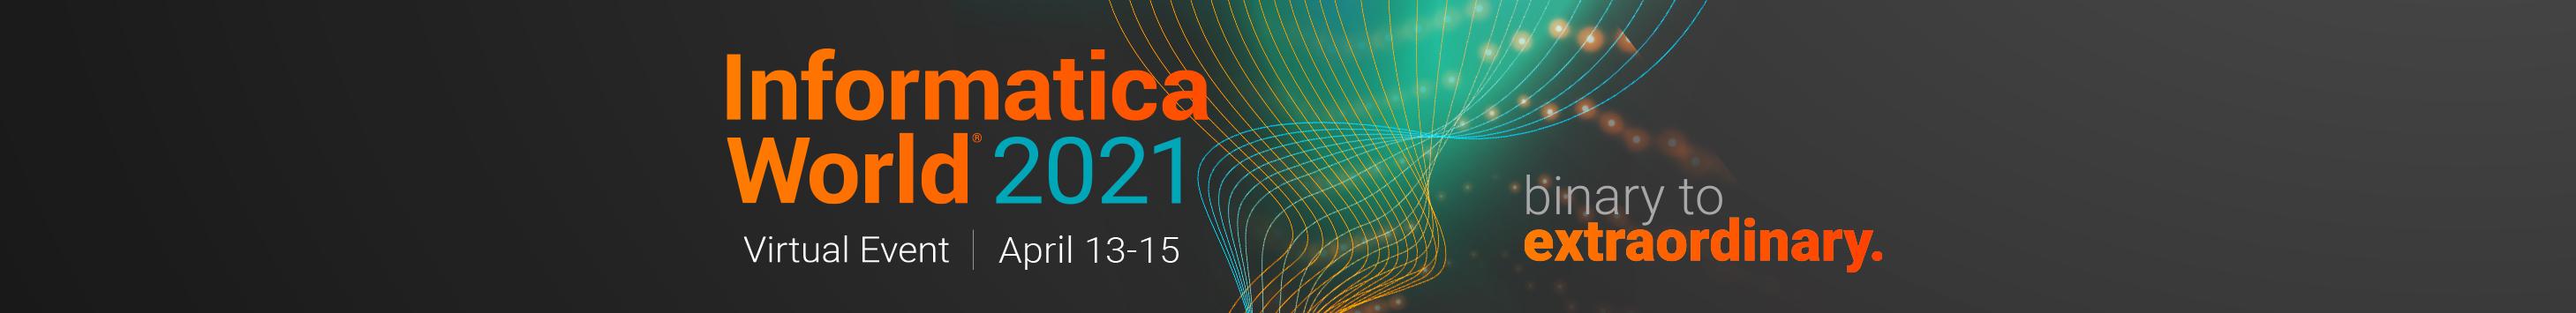 Informatica World 2021